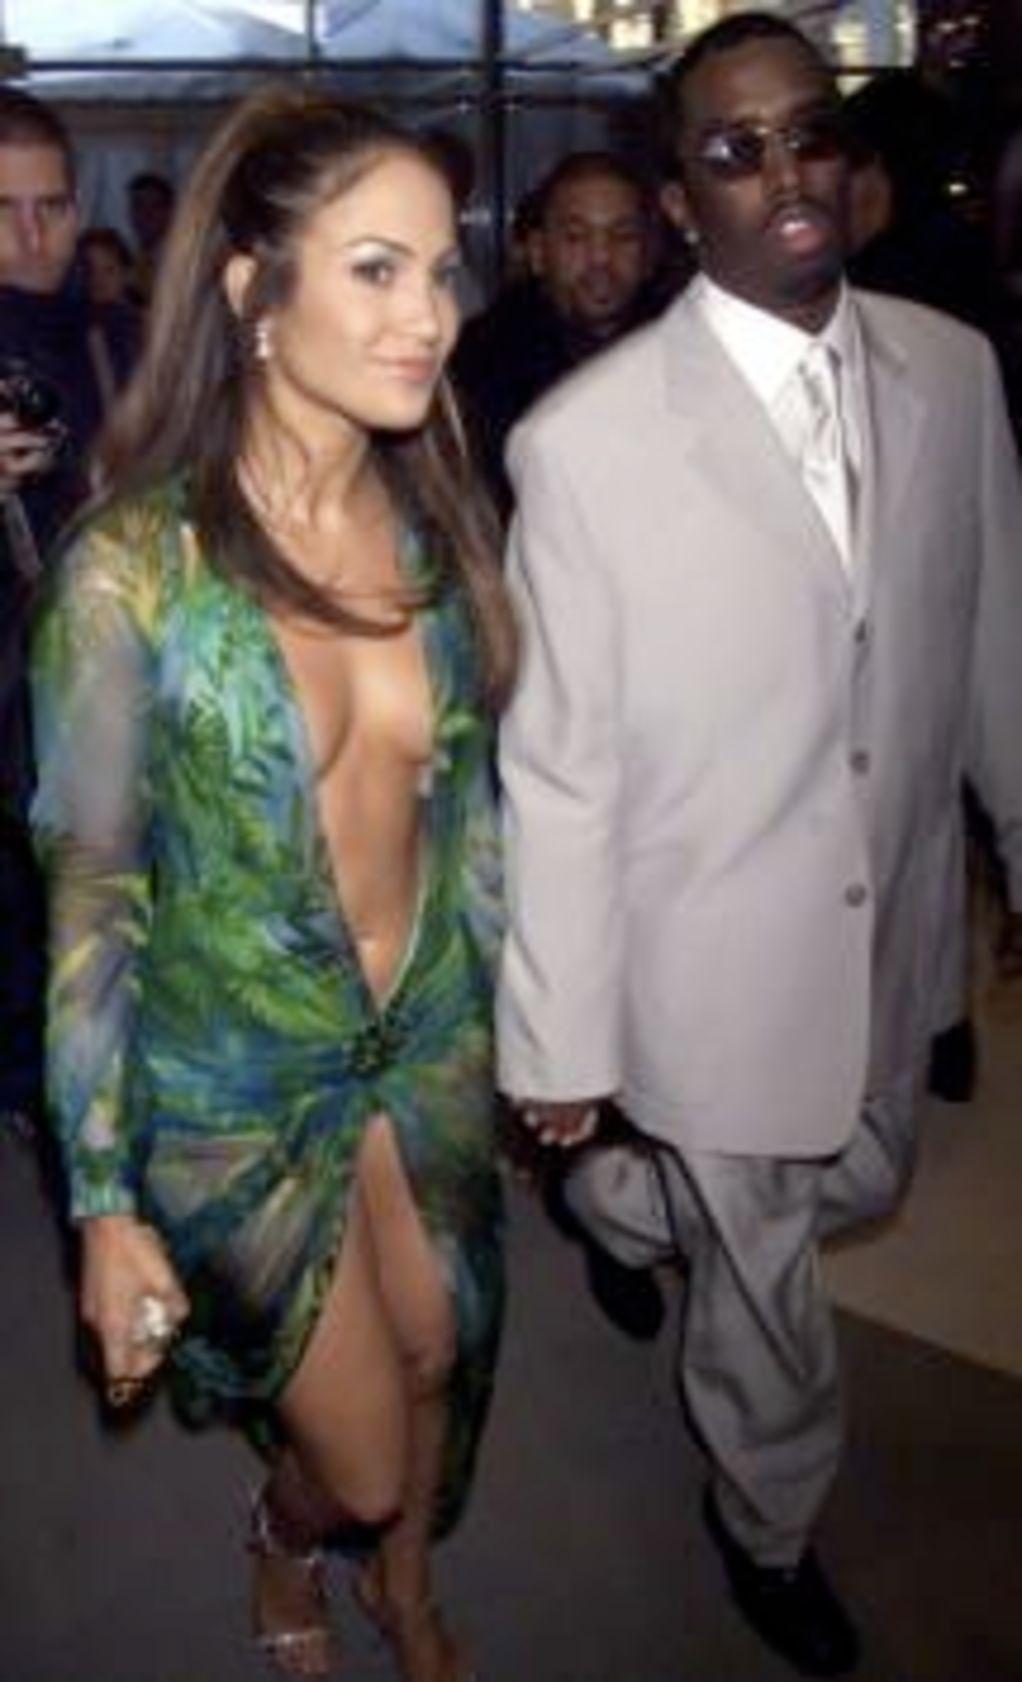 Wedding dress nip slip  Jennifer Lopez Her Men and Her Outfits Weddings Nip Slips Red